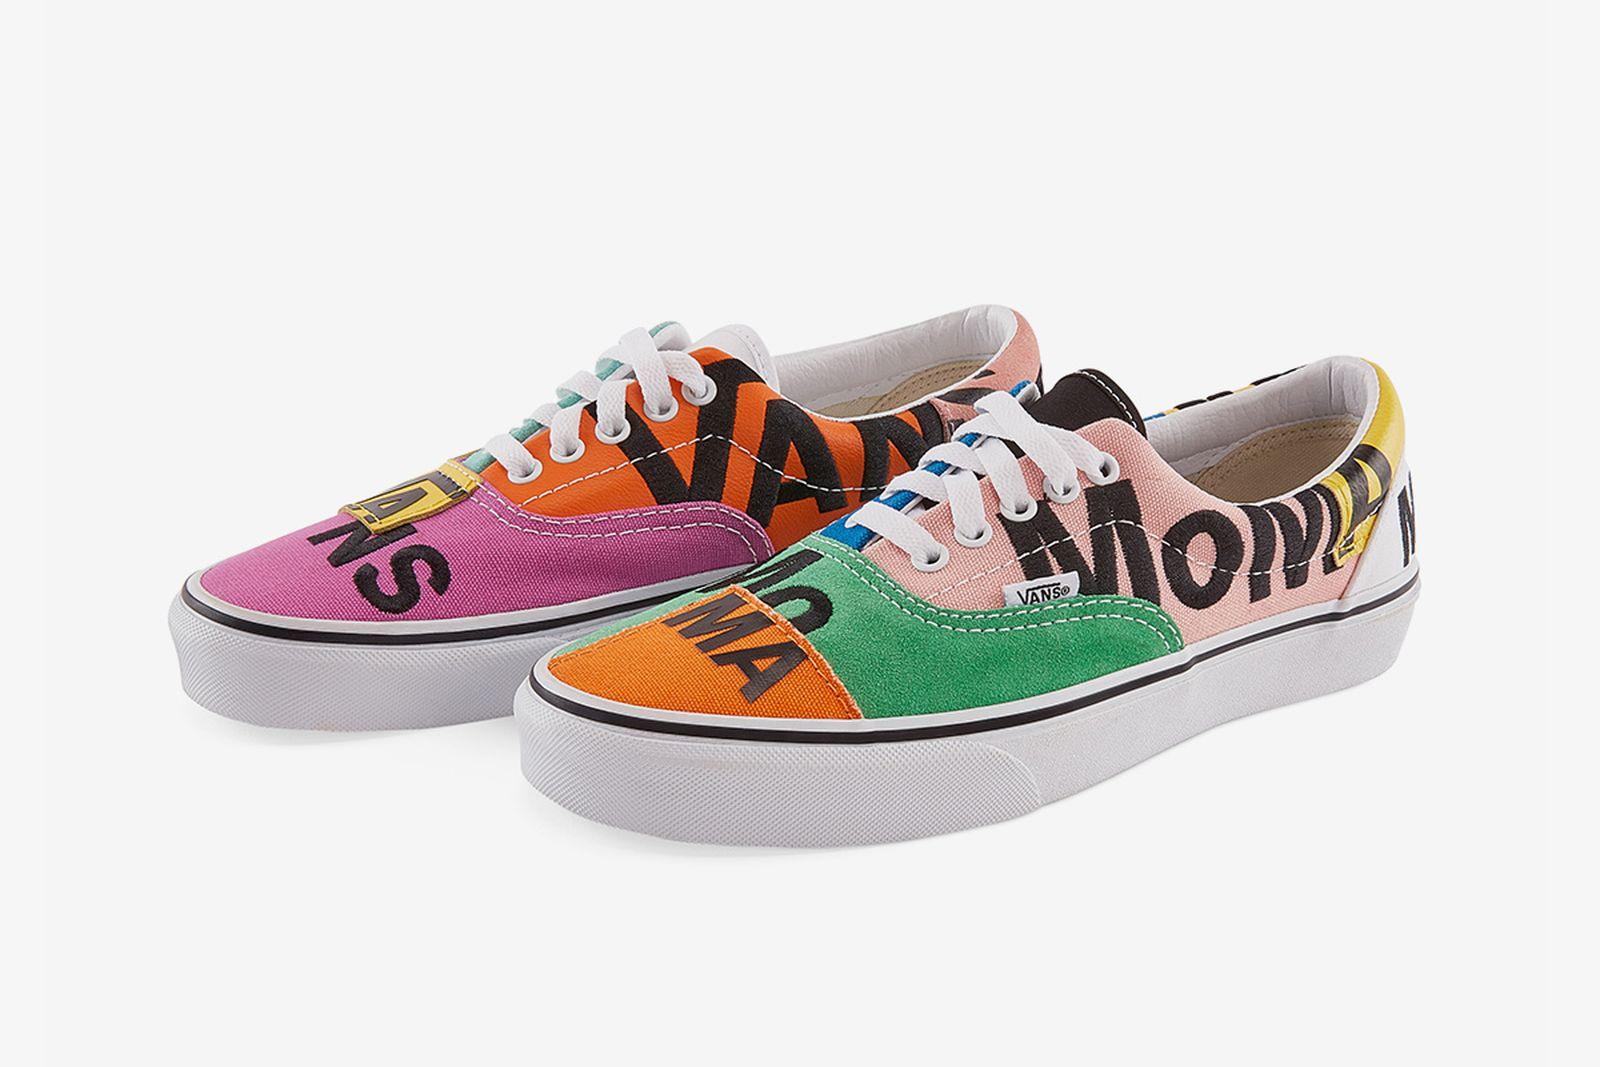 moma vans era release date price